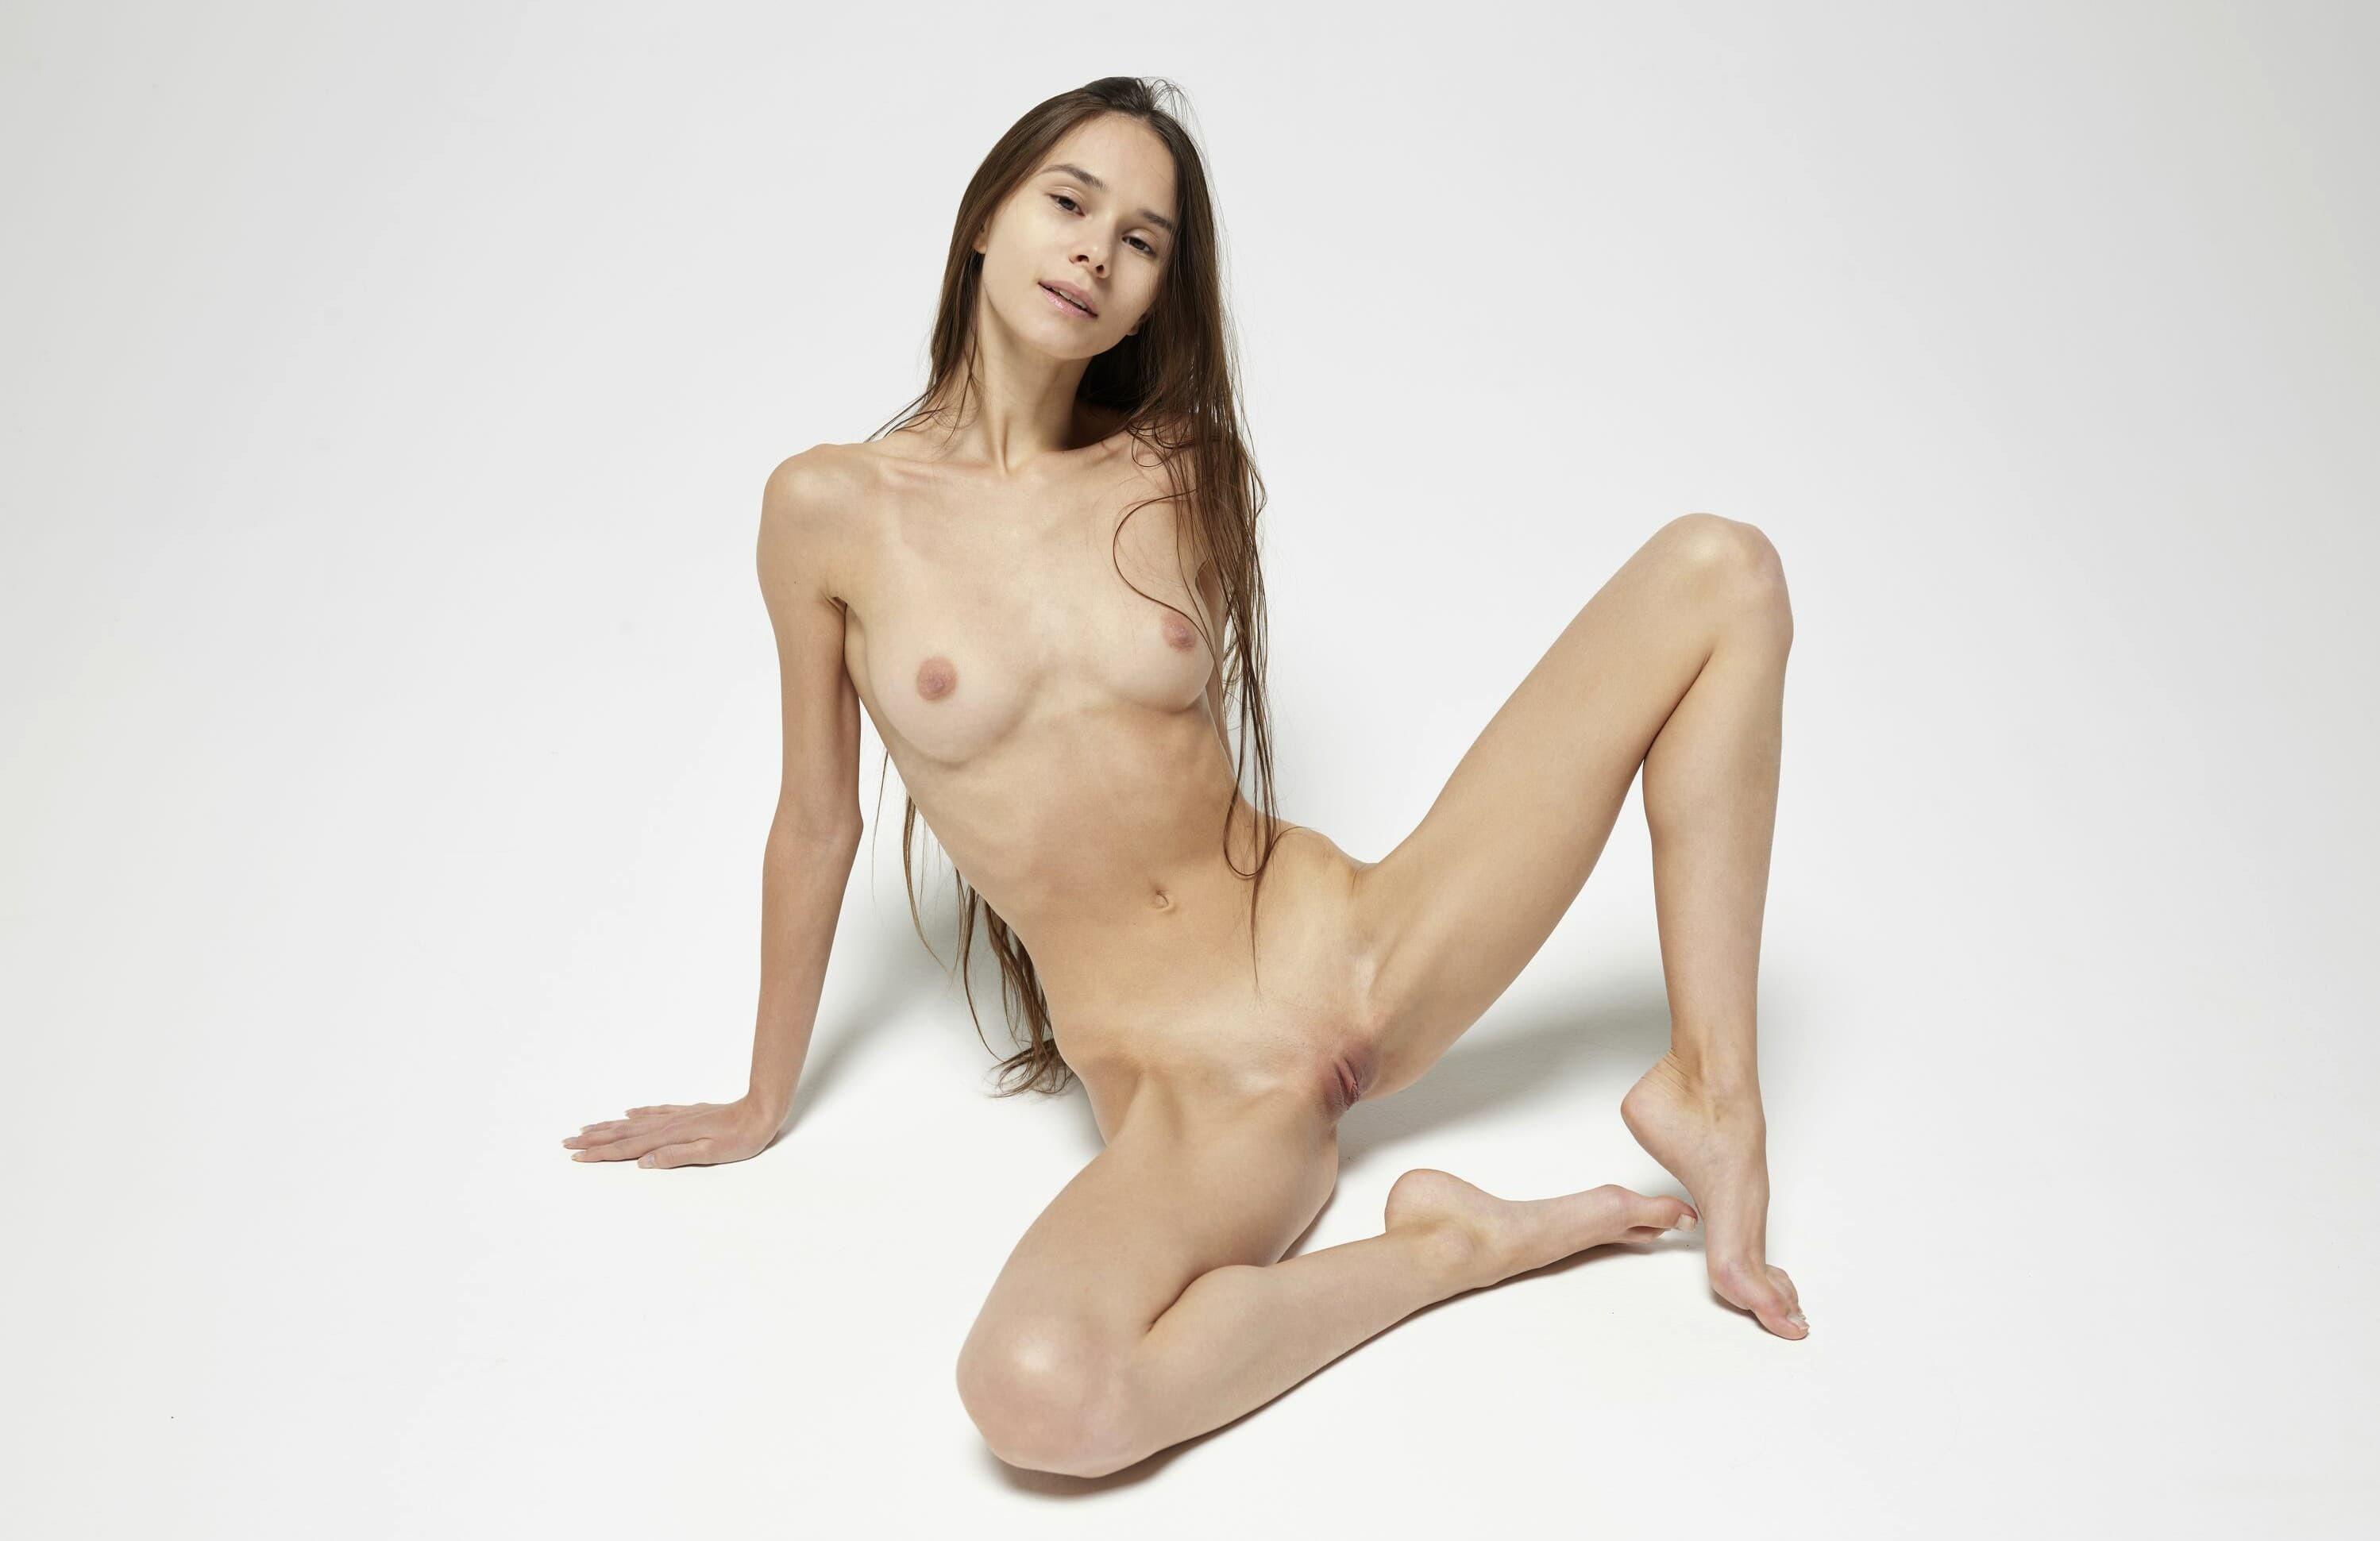 Девушка широко раздвинула ноги и письку - фото